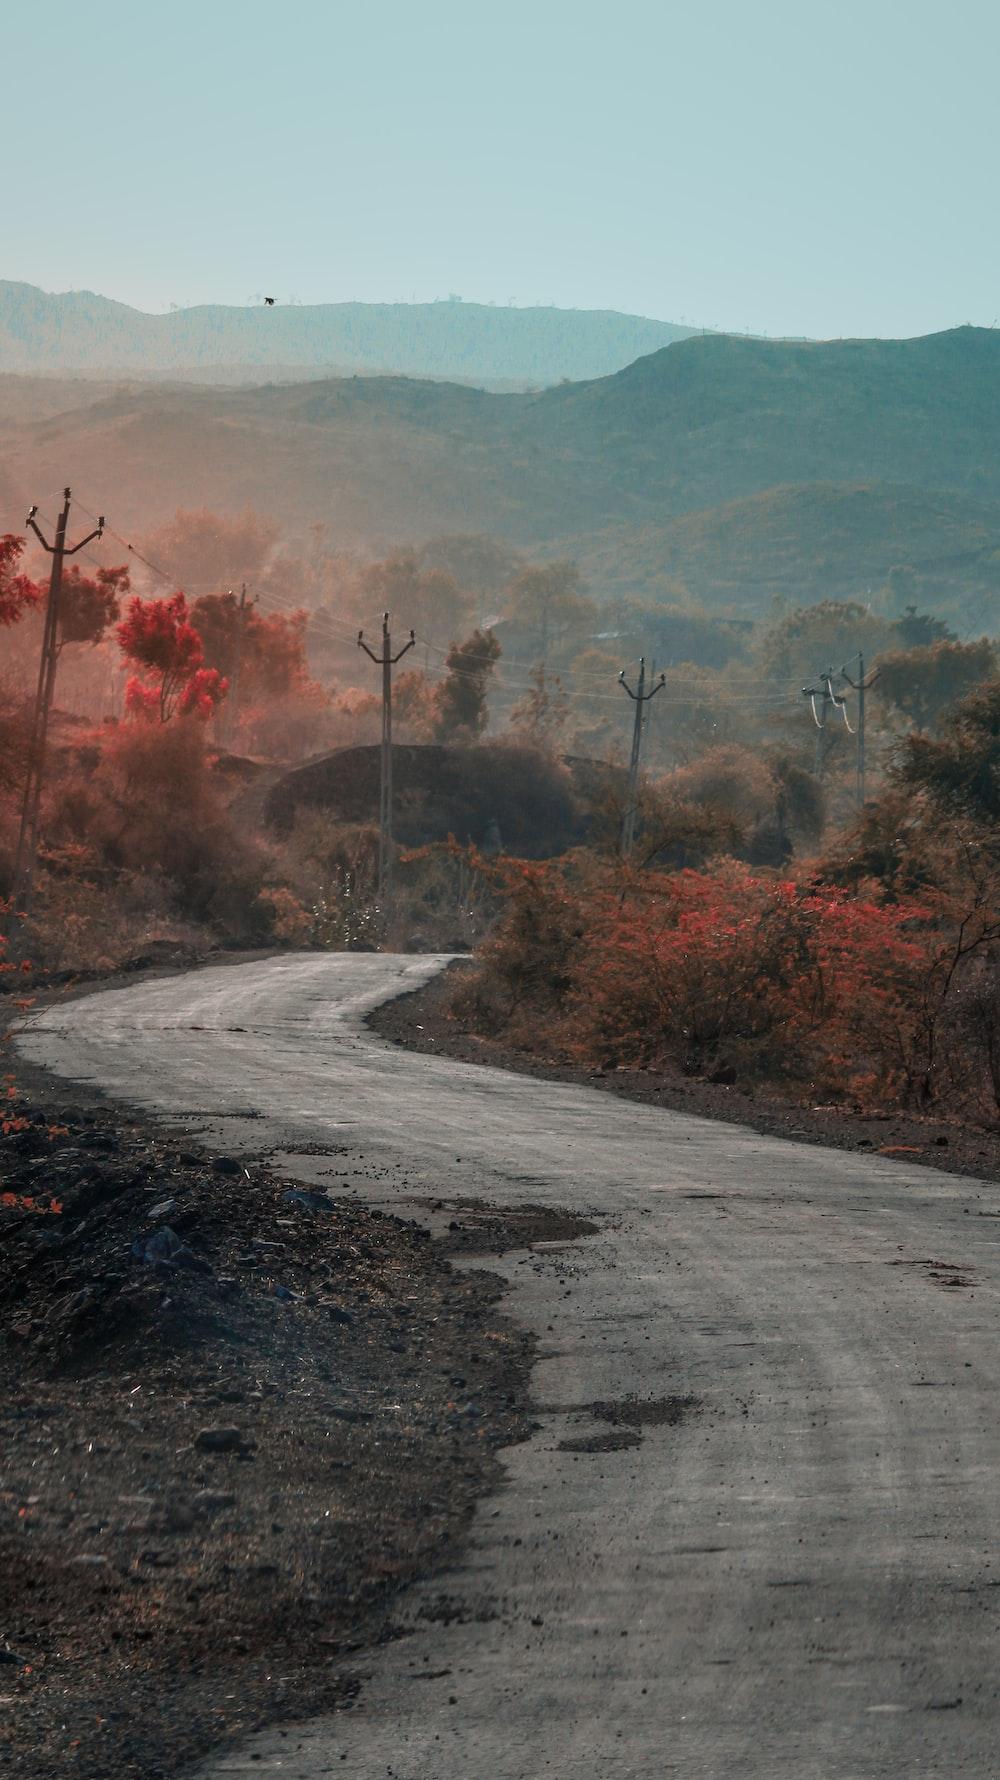 view of dirt road through rural area